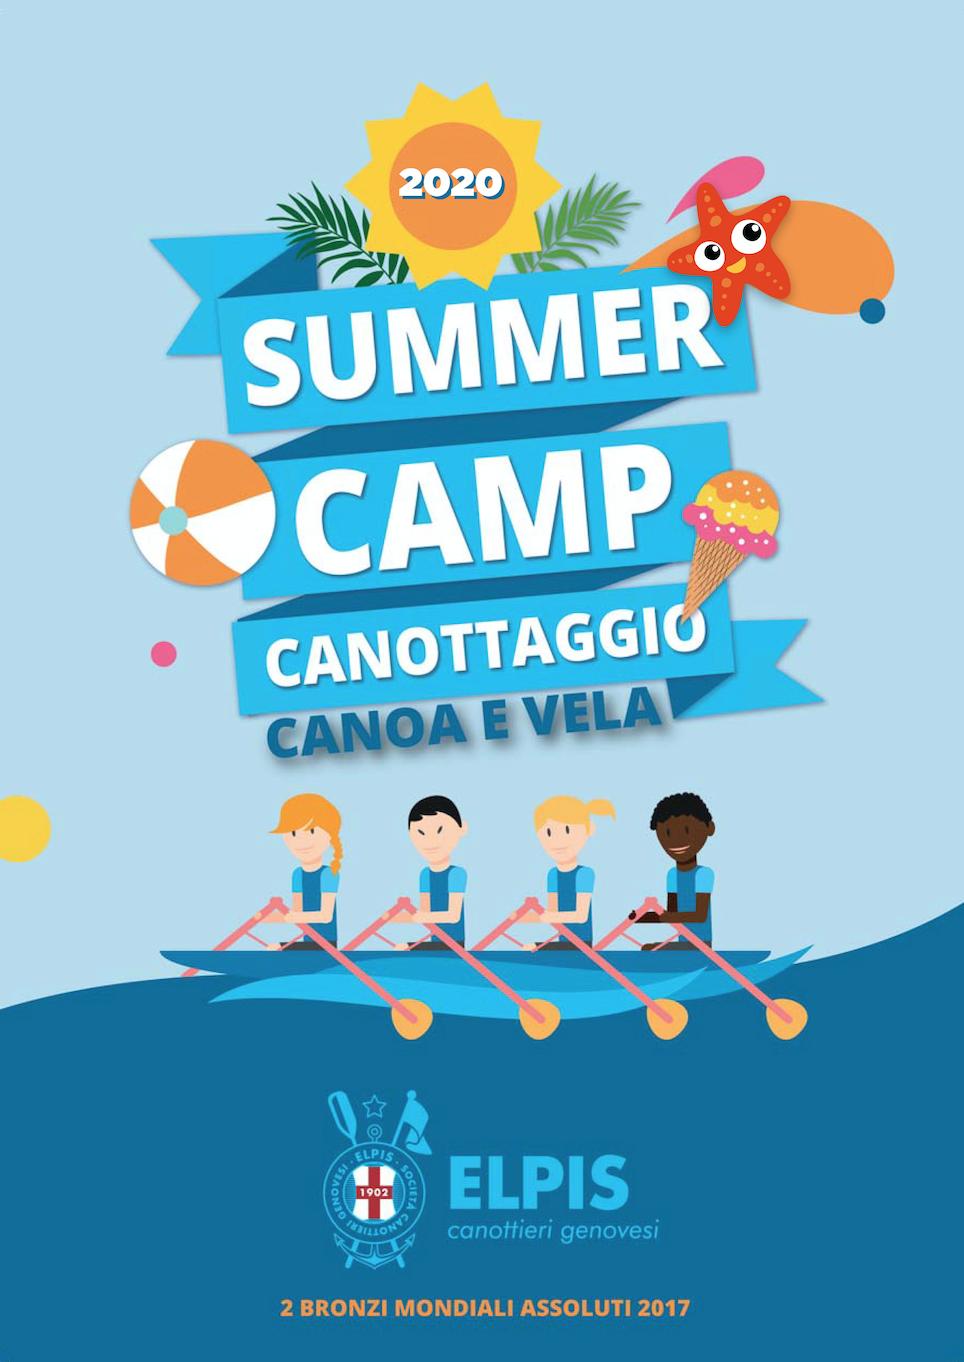 Elpis Summer Camp 2020